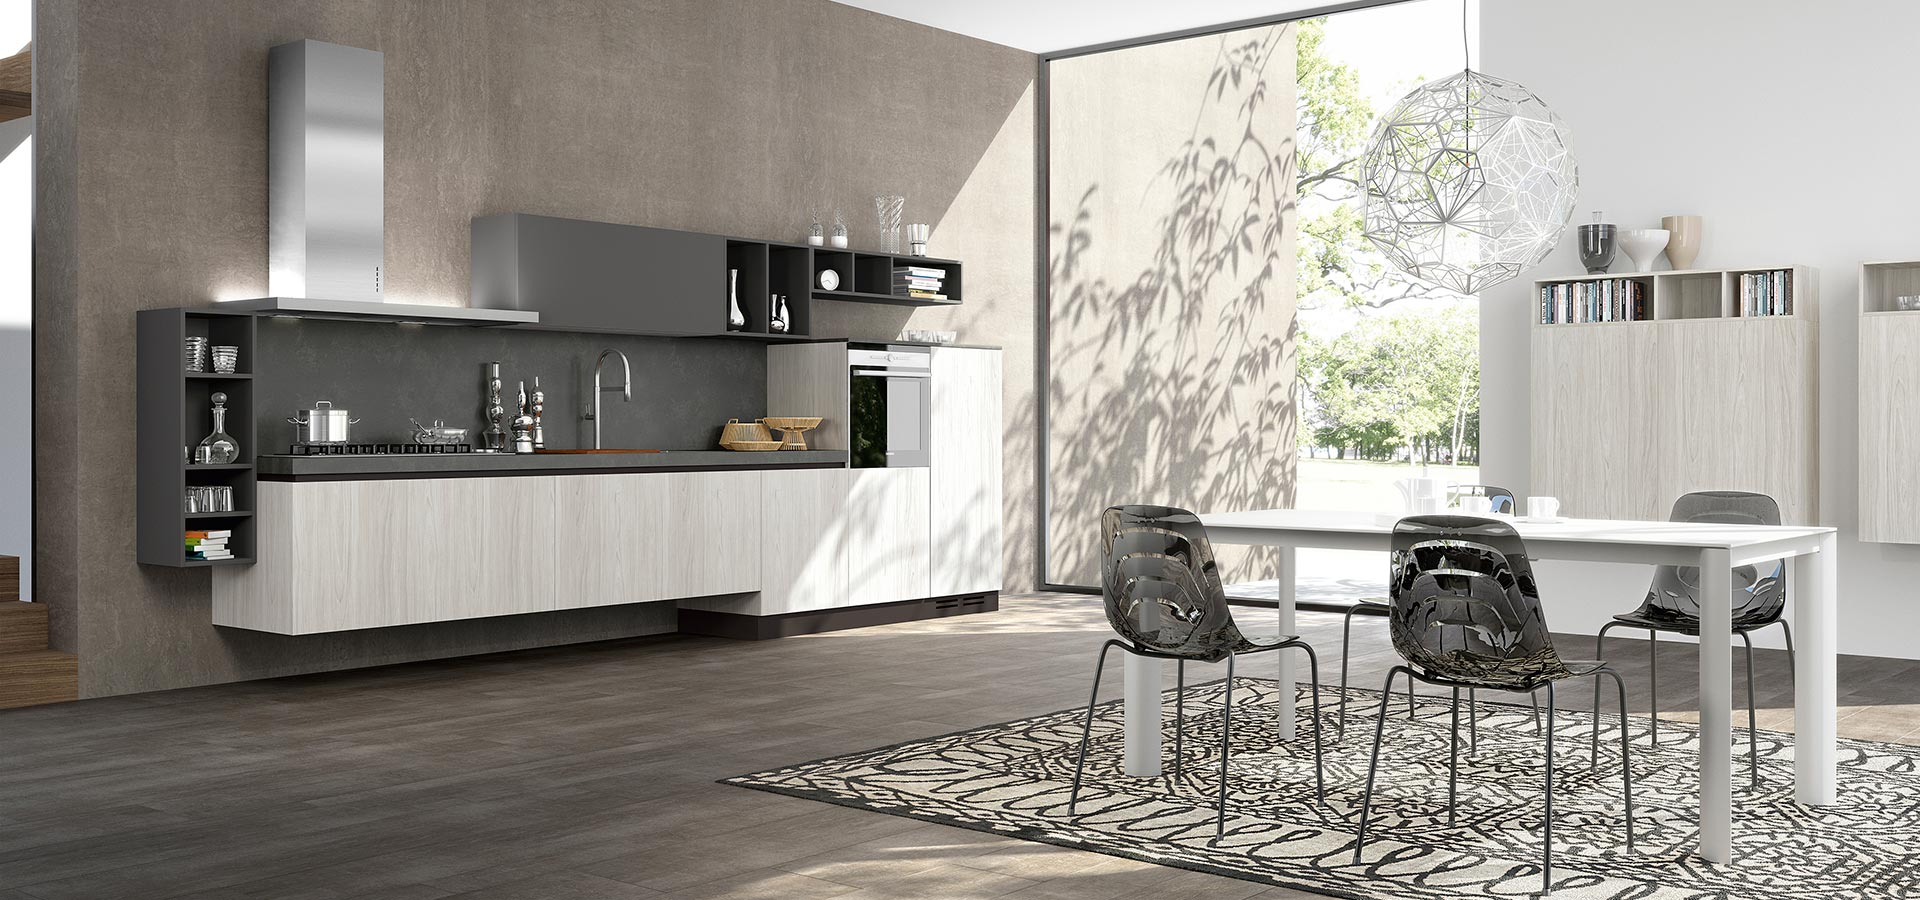 Arredamenti Gallomobili Mobili Udine - Cucine Moderne - Cucina Linea ...